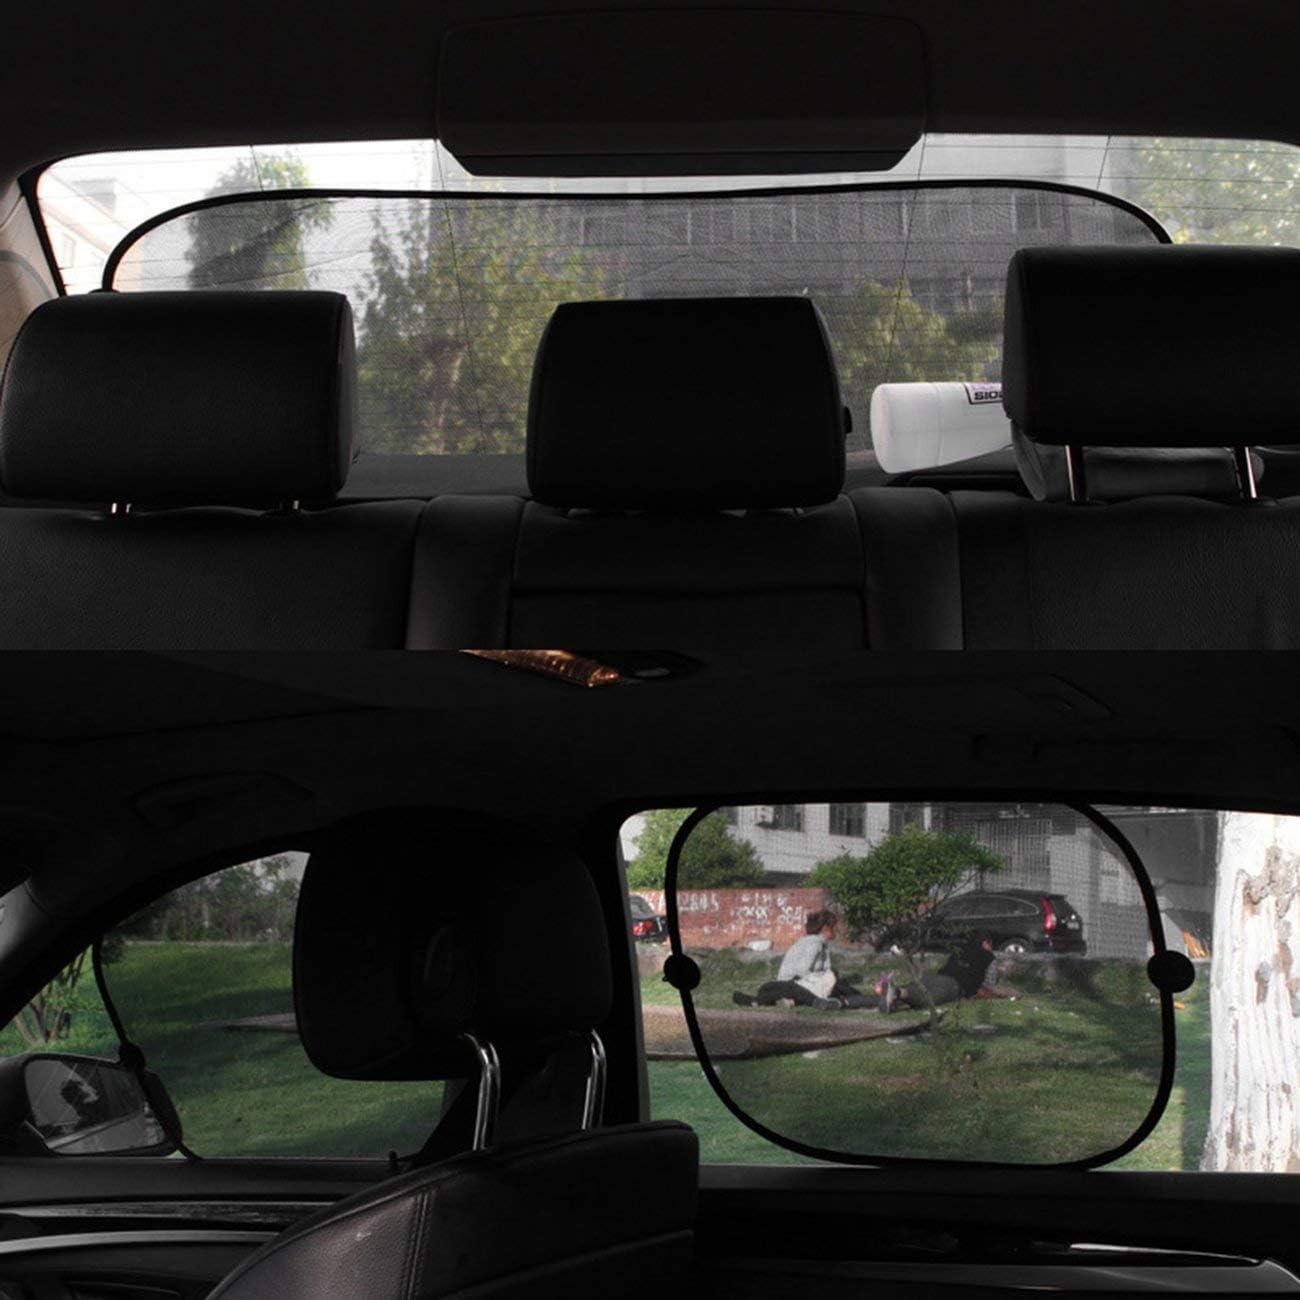 Panda 5pcs//Set Car Window Sunshade Mesh Auto Sun Visor Curtain with Suction Cup Front Rear Side Curtain Car Styling Covers Sunshade Black